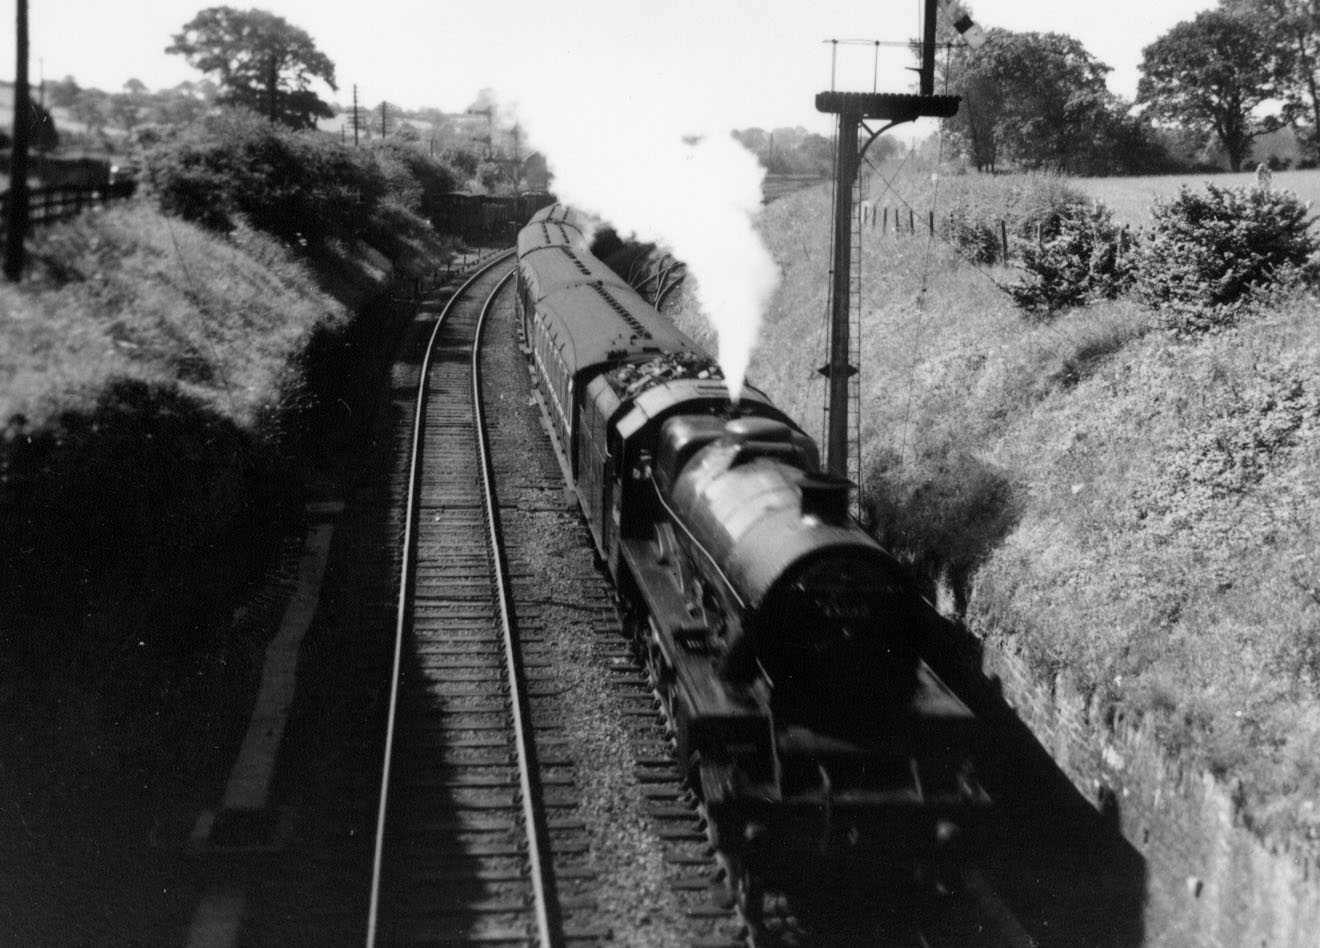 45642 Boscawen at Mangotsfield North Junction in 1952